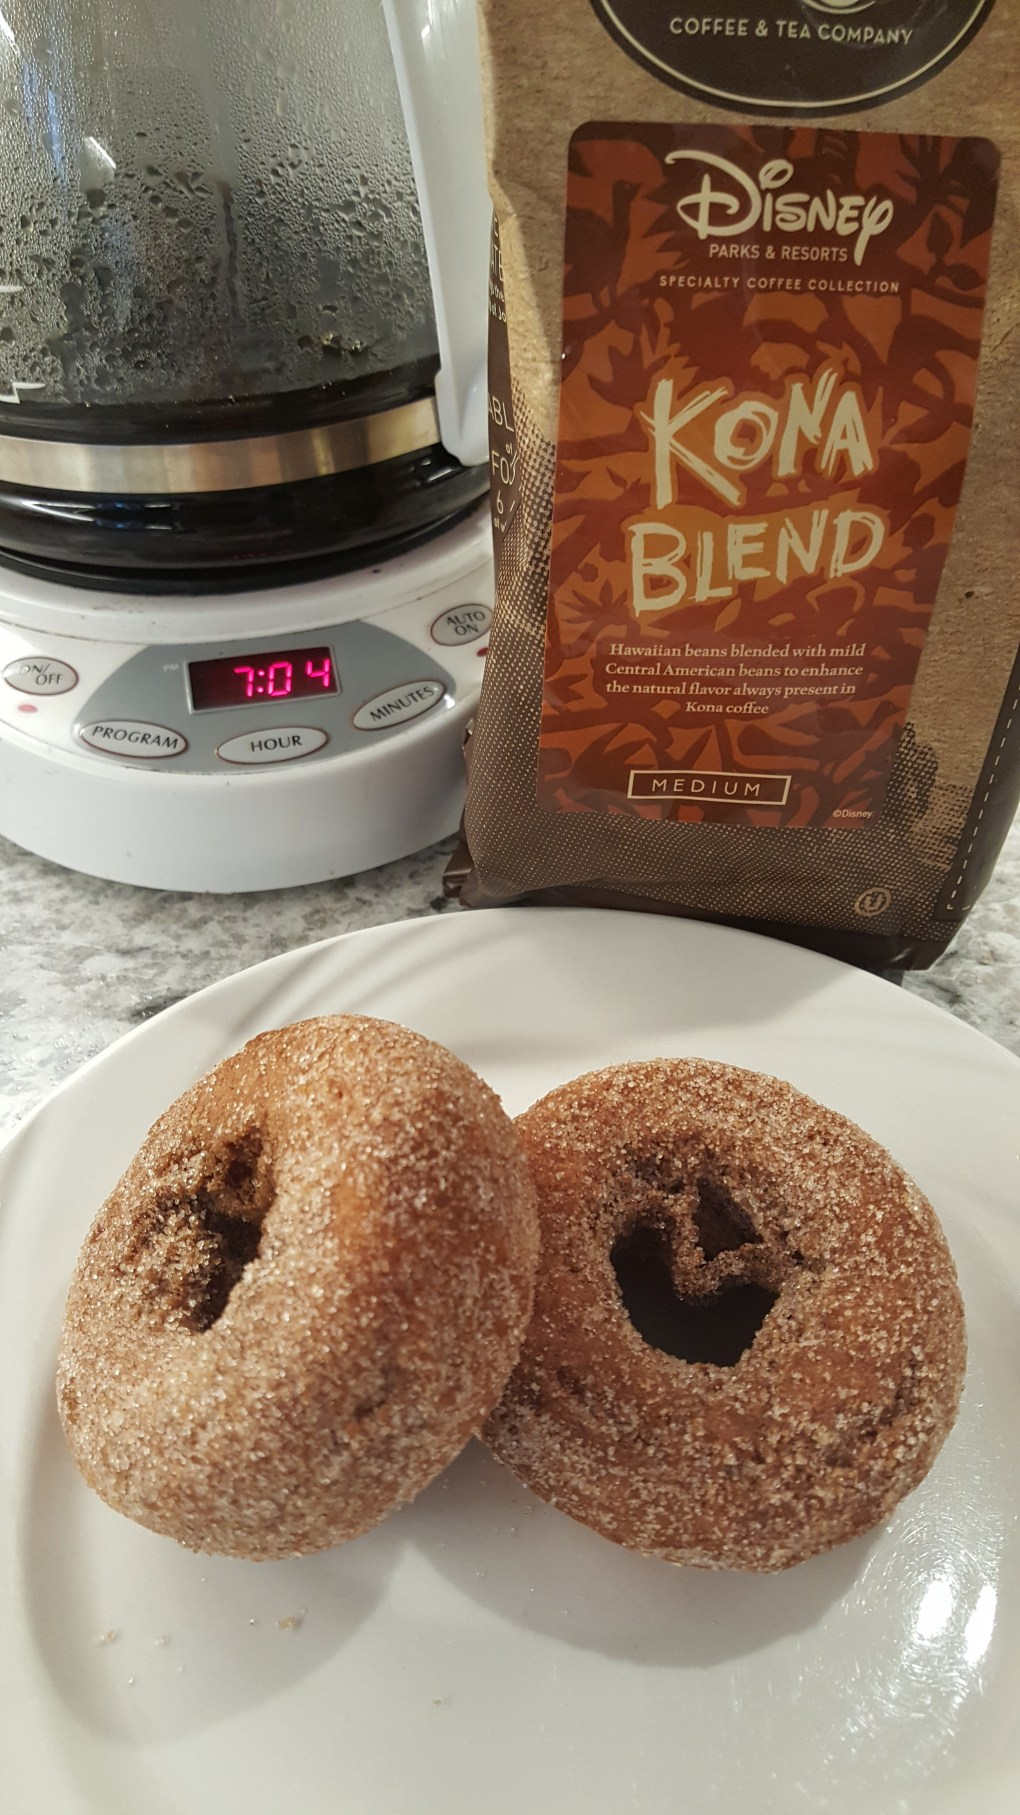 Disney's Kona coffee and donuts